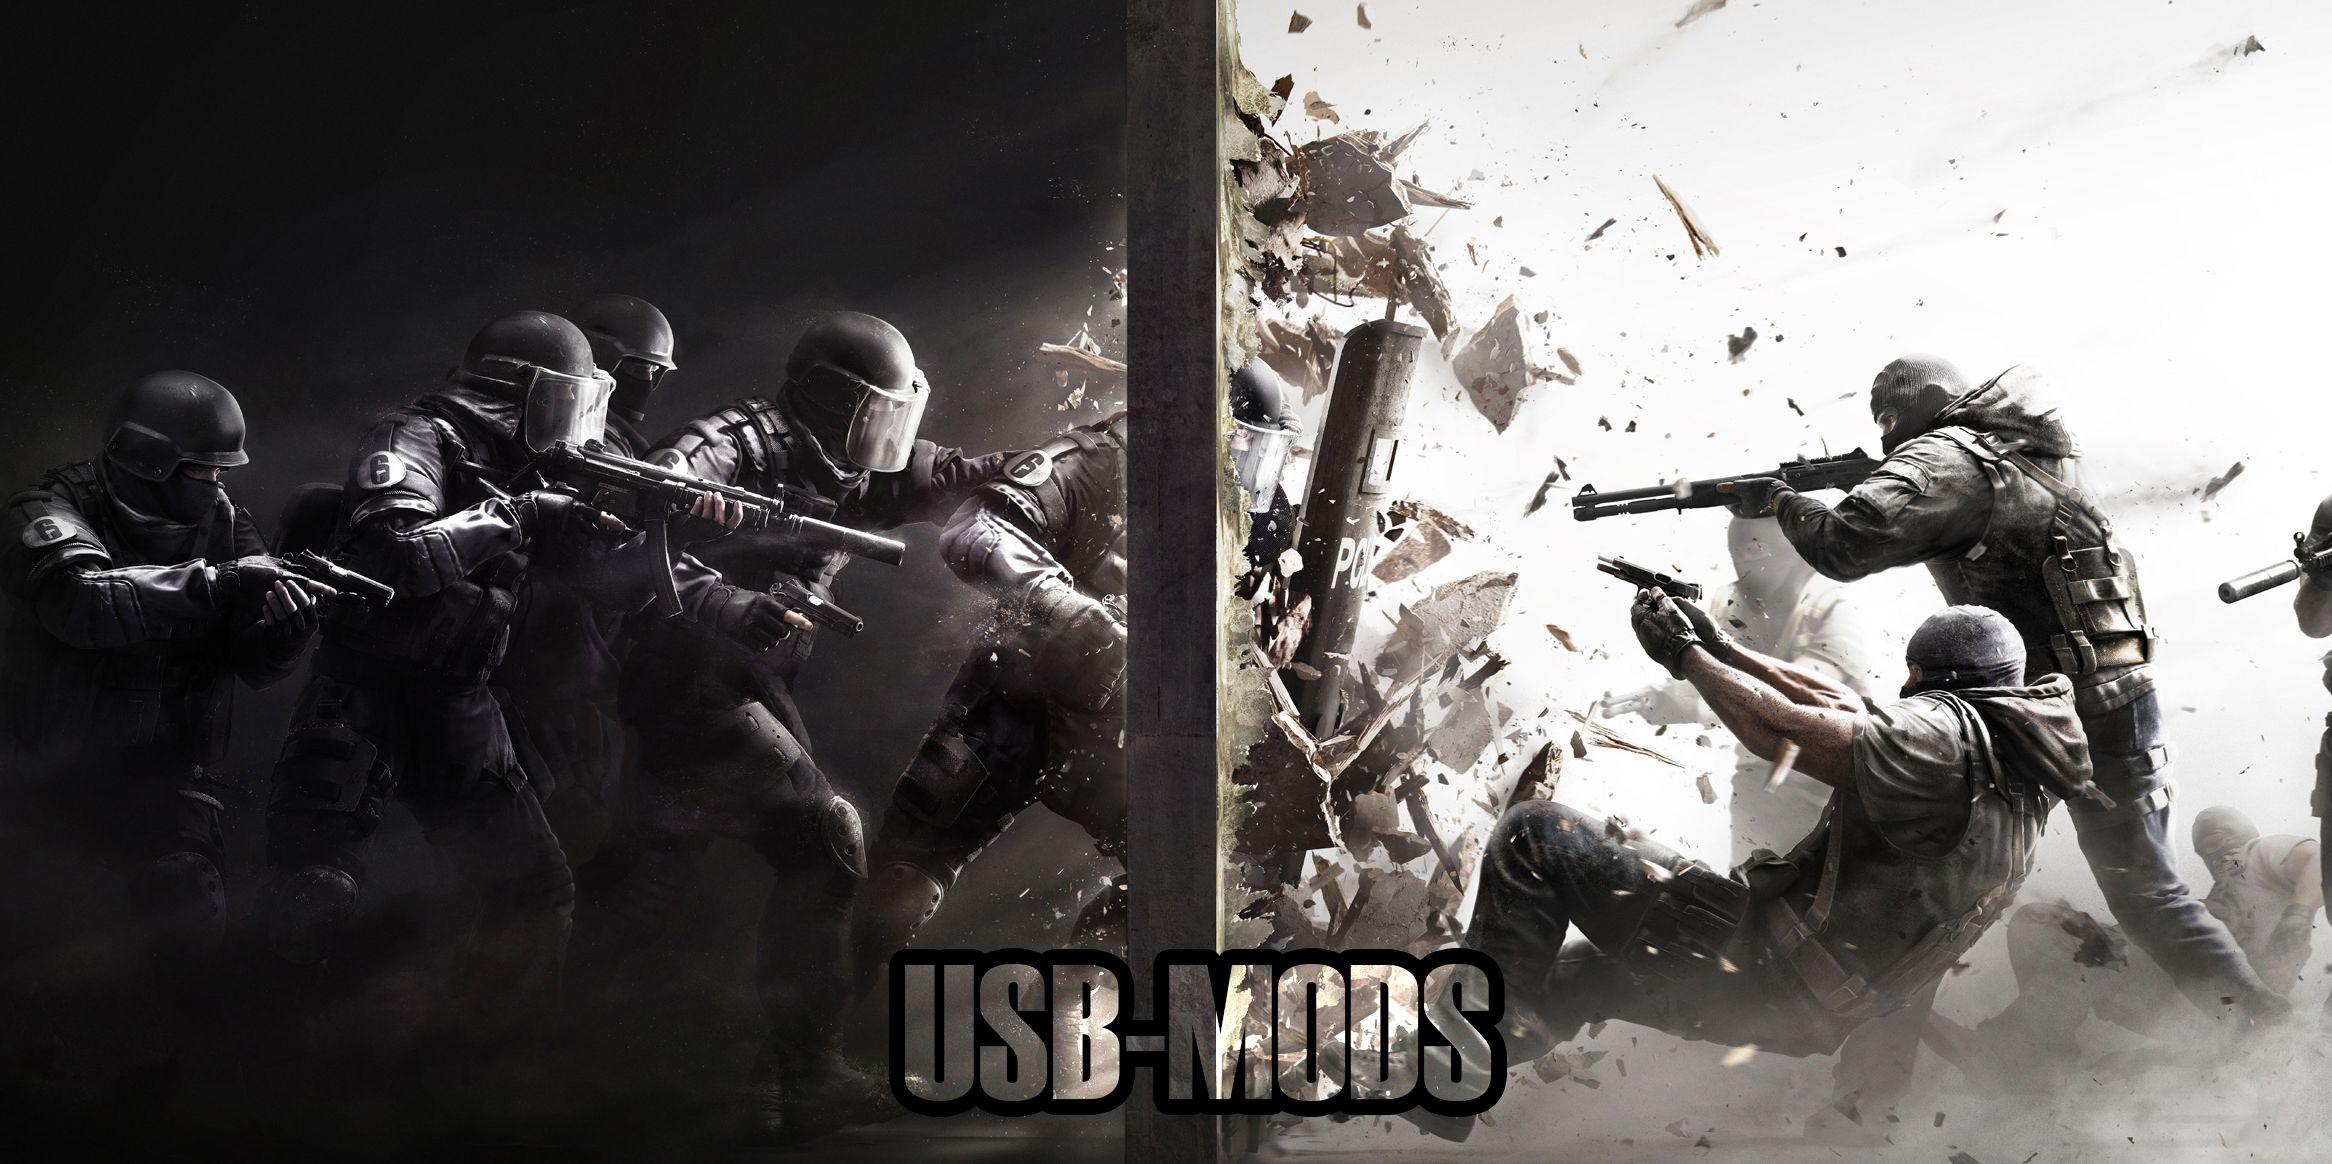 usb mods Tom clancy's rainbow six, Ps4 games, Rainbow